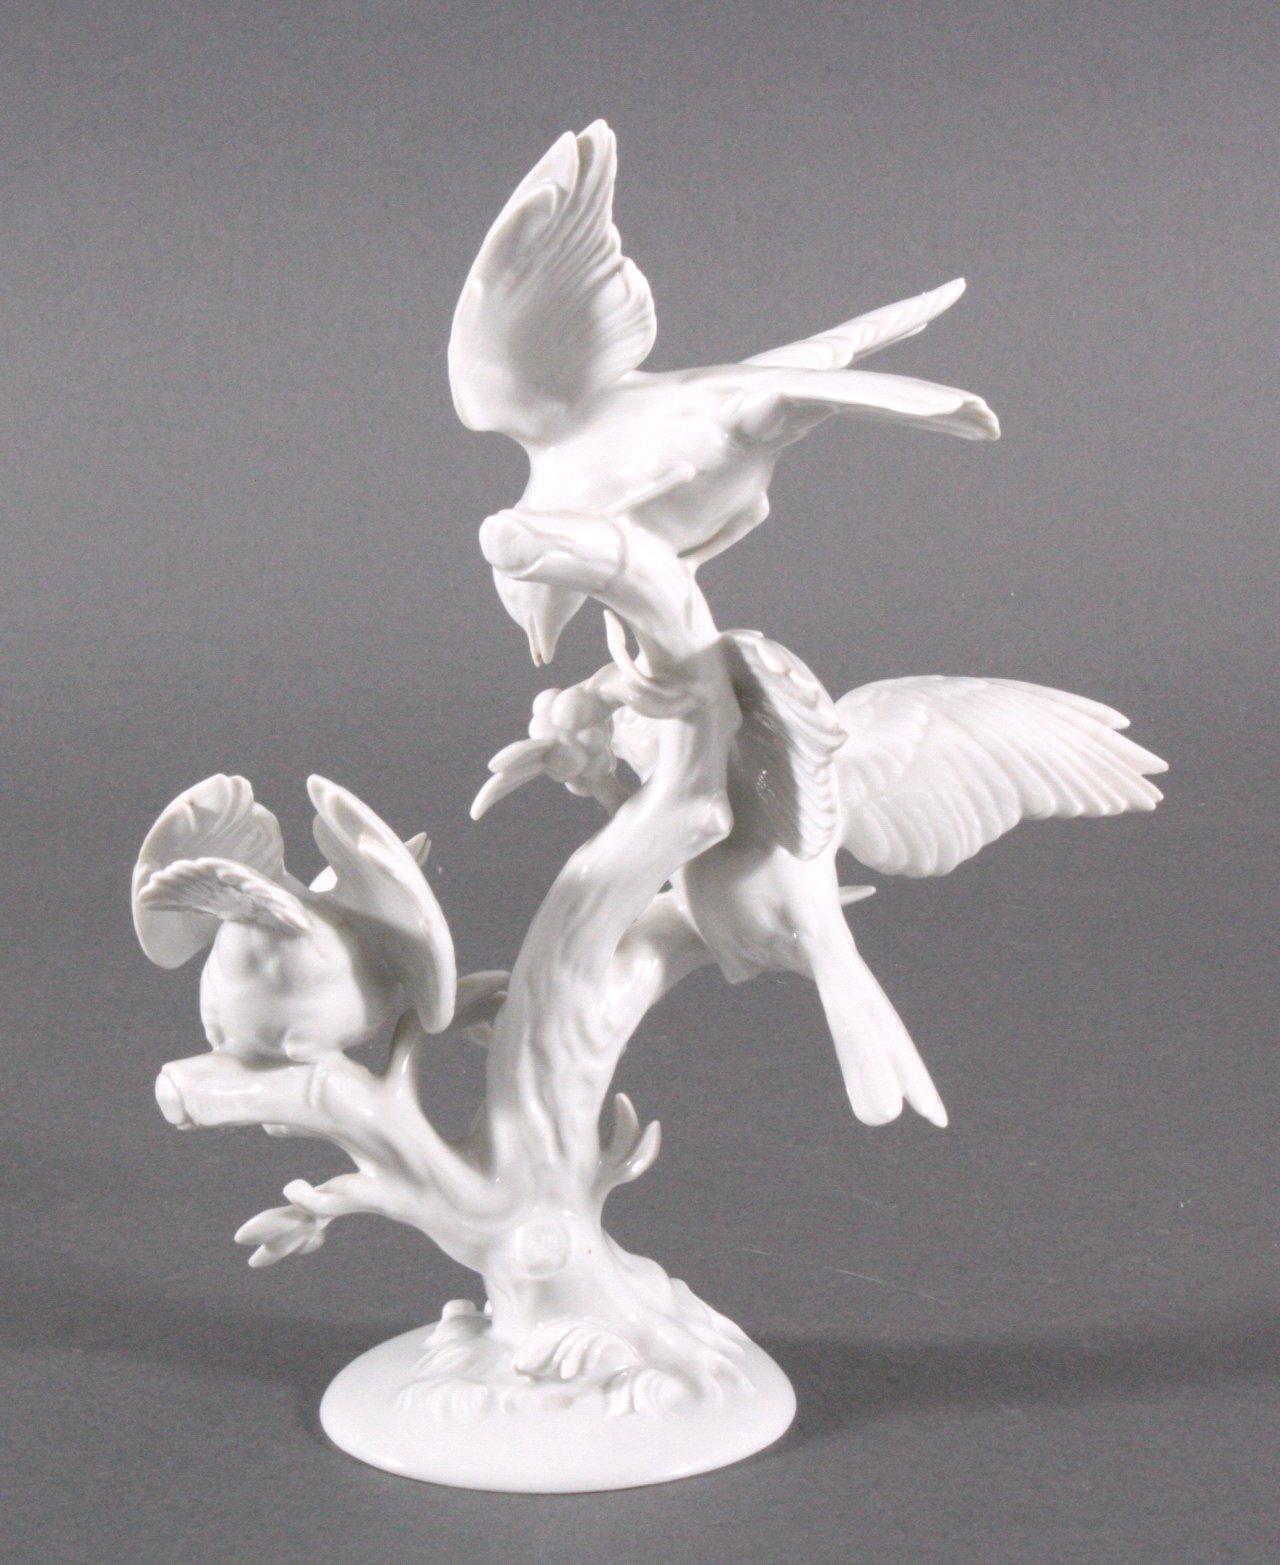 Rosenthal Vogelplastik-1